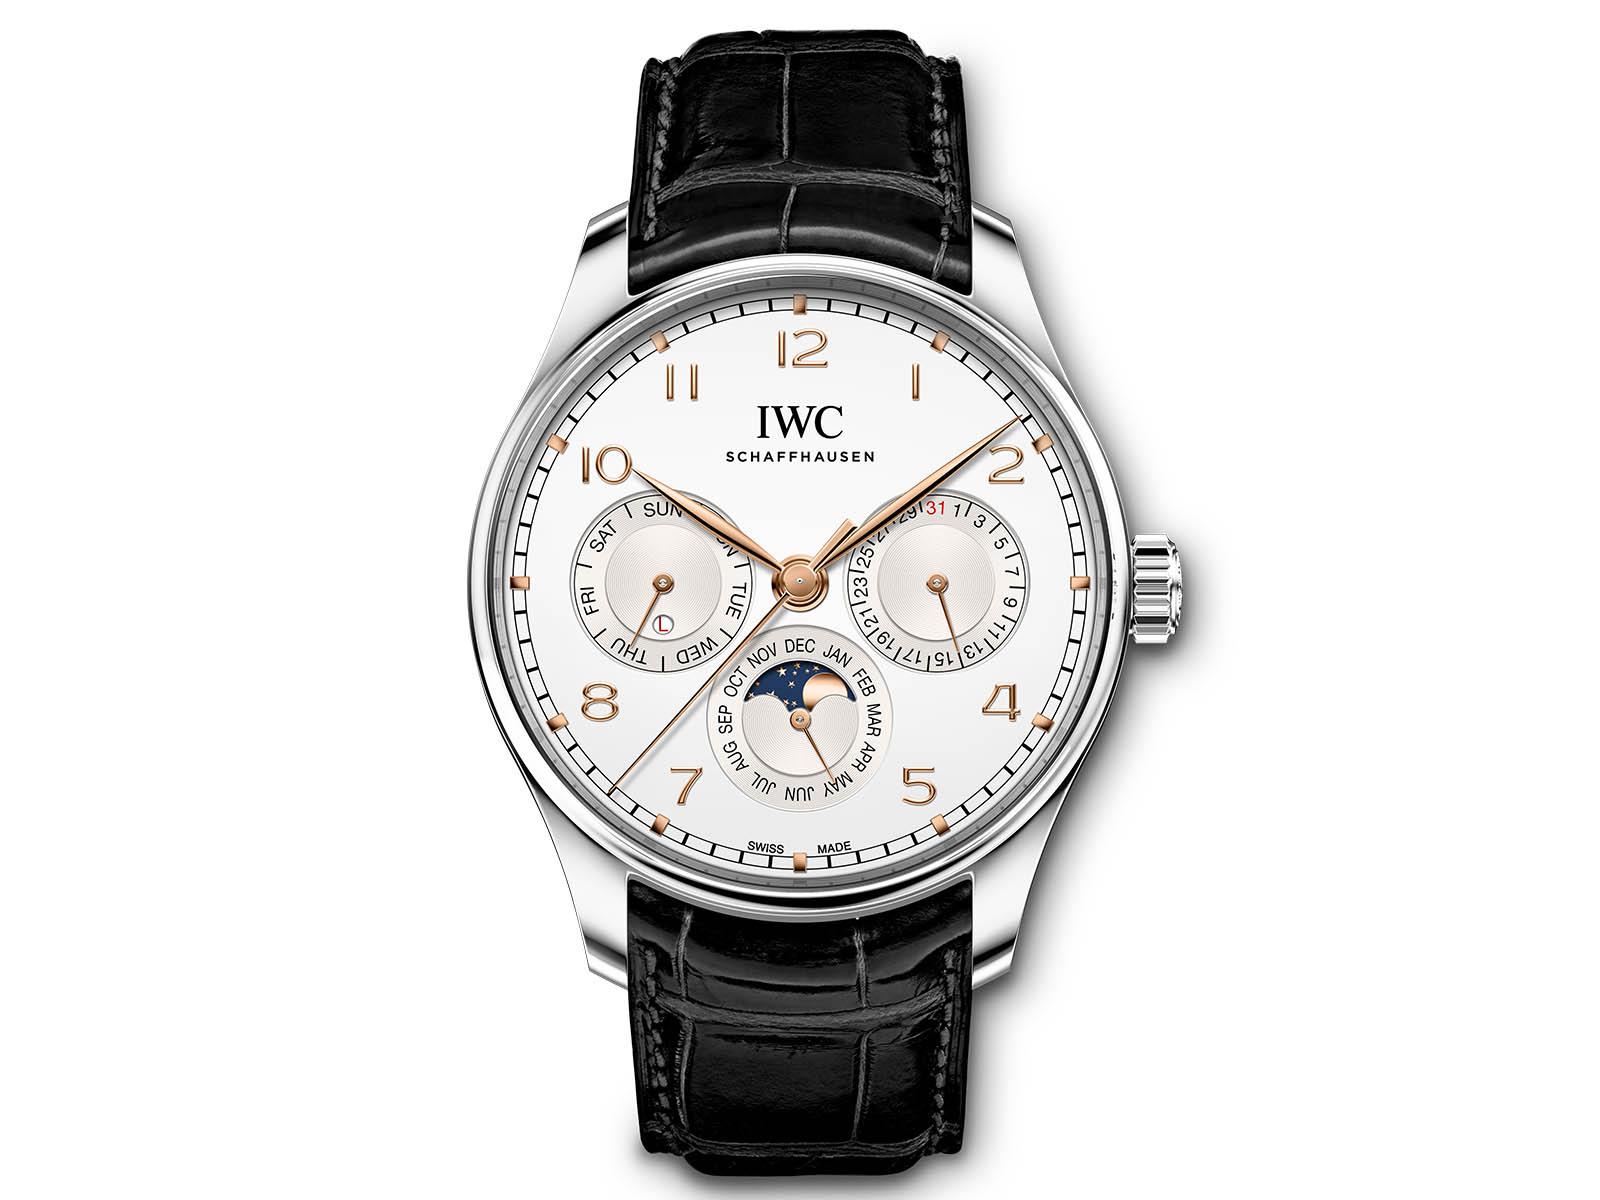 iw344203-iwc-schaffhausen-portugieser-perpetual-calendar-42-watches-wonders-2020-1.jpg